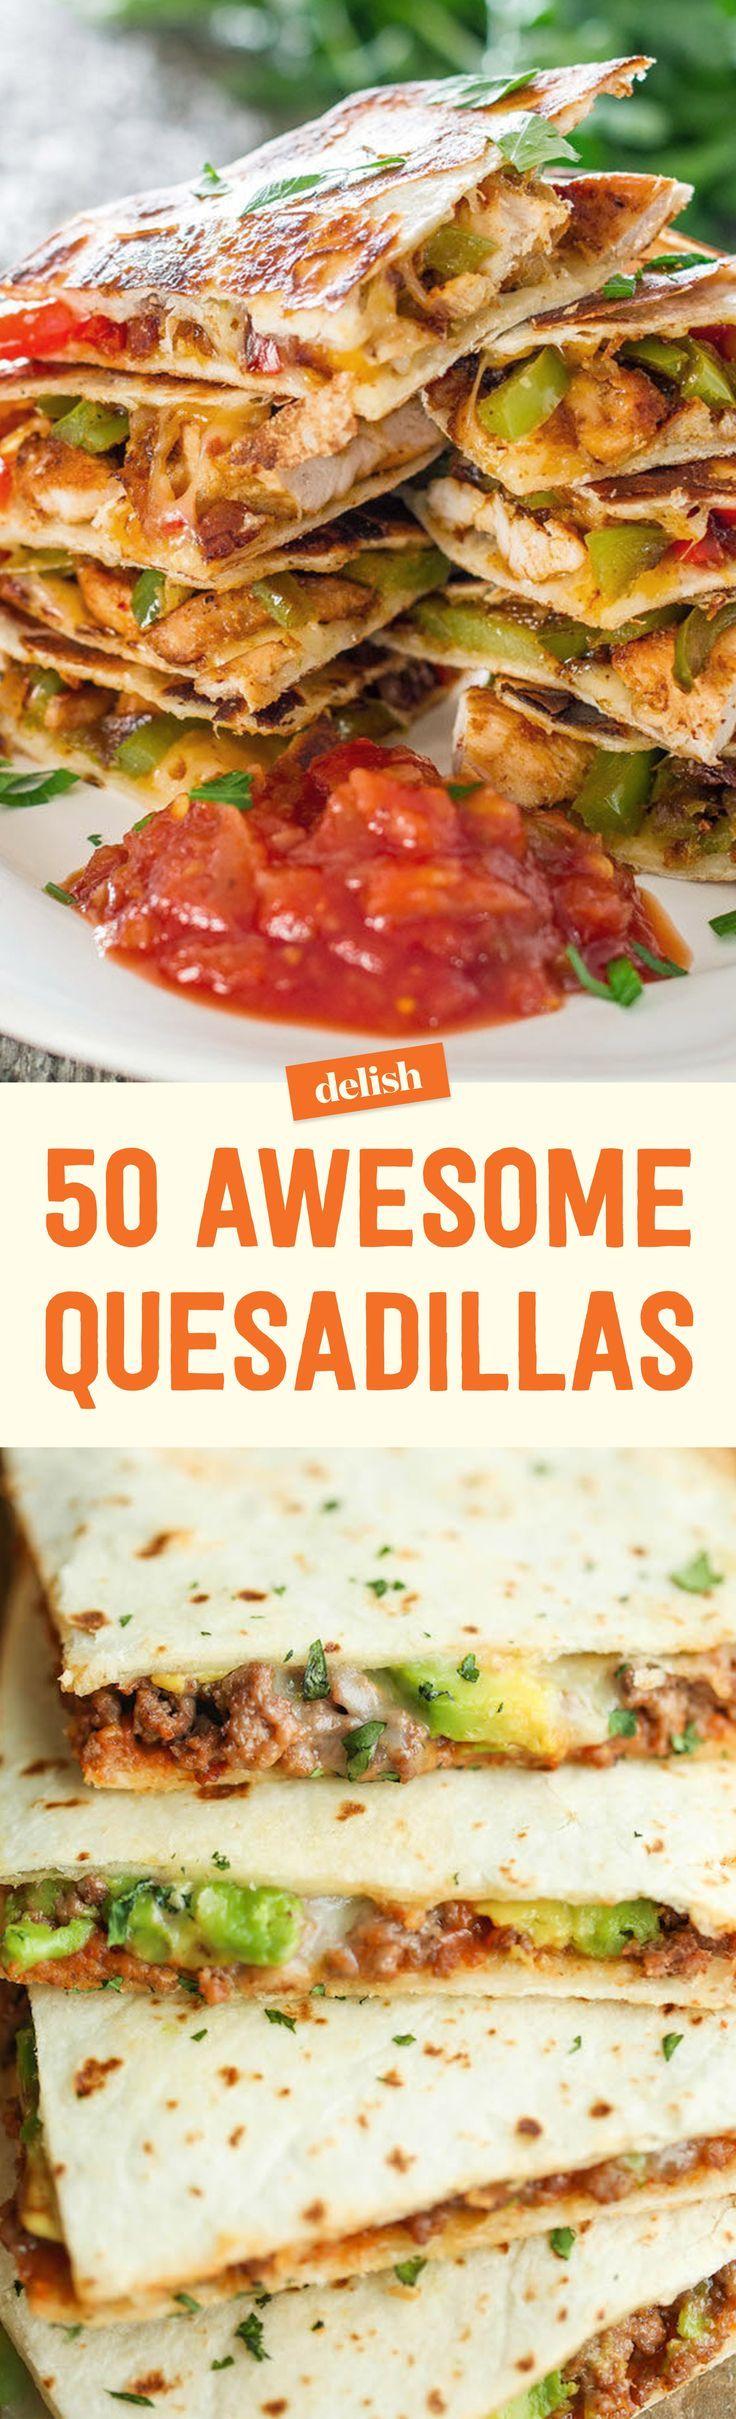 Italian Sausage Quesadillas with Spicy Tomato Sauce (Hidden Avocado Recipes)